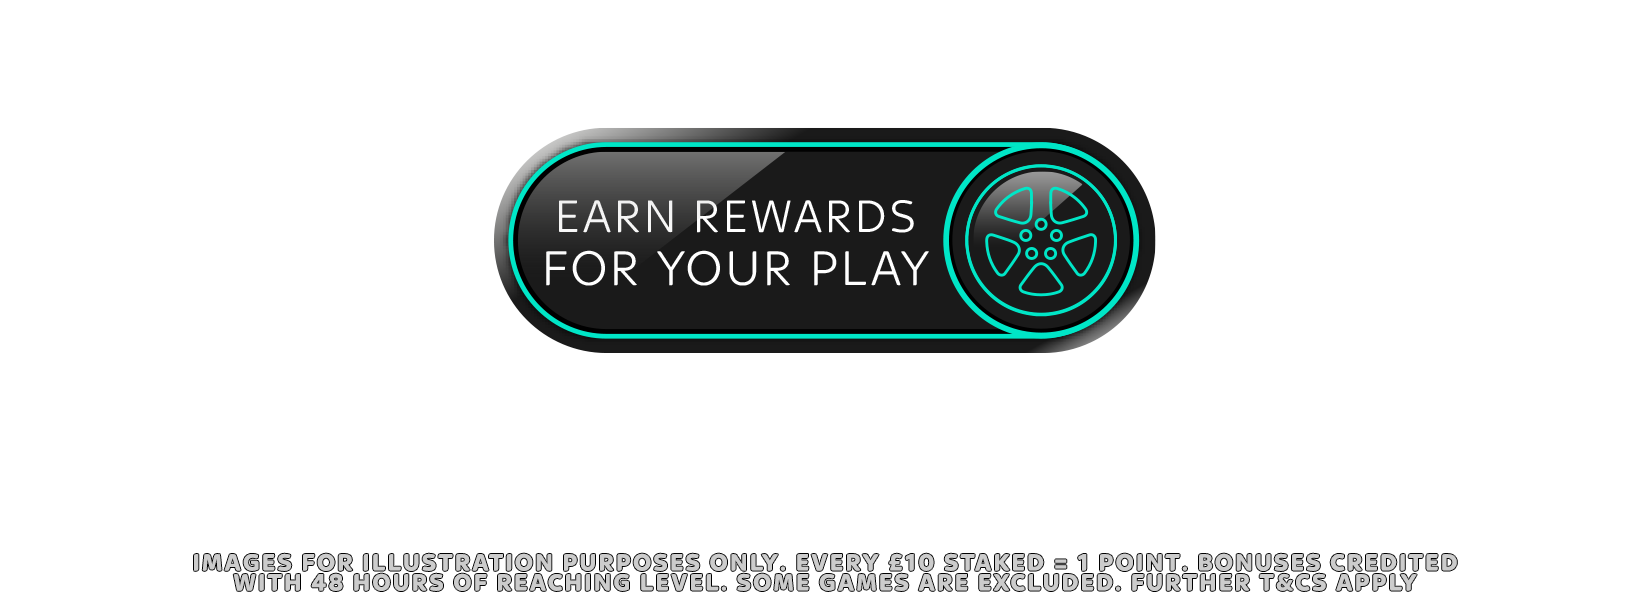 C.O.The.Drive.Cash.Rewards.Ladder.1